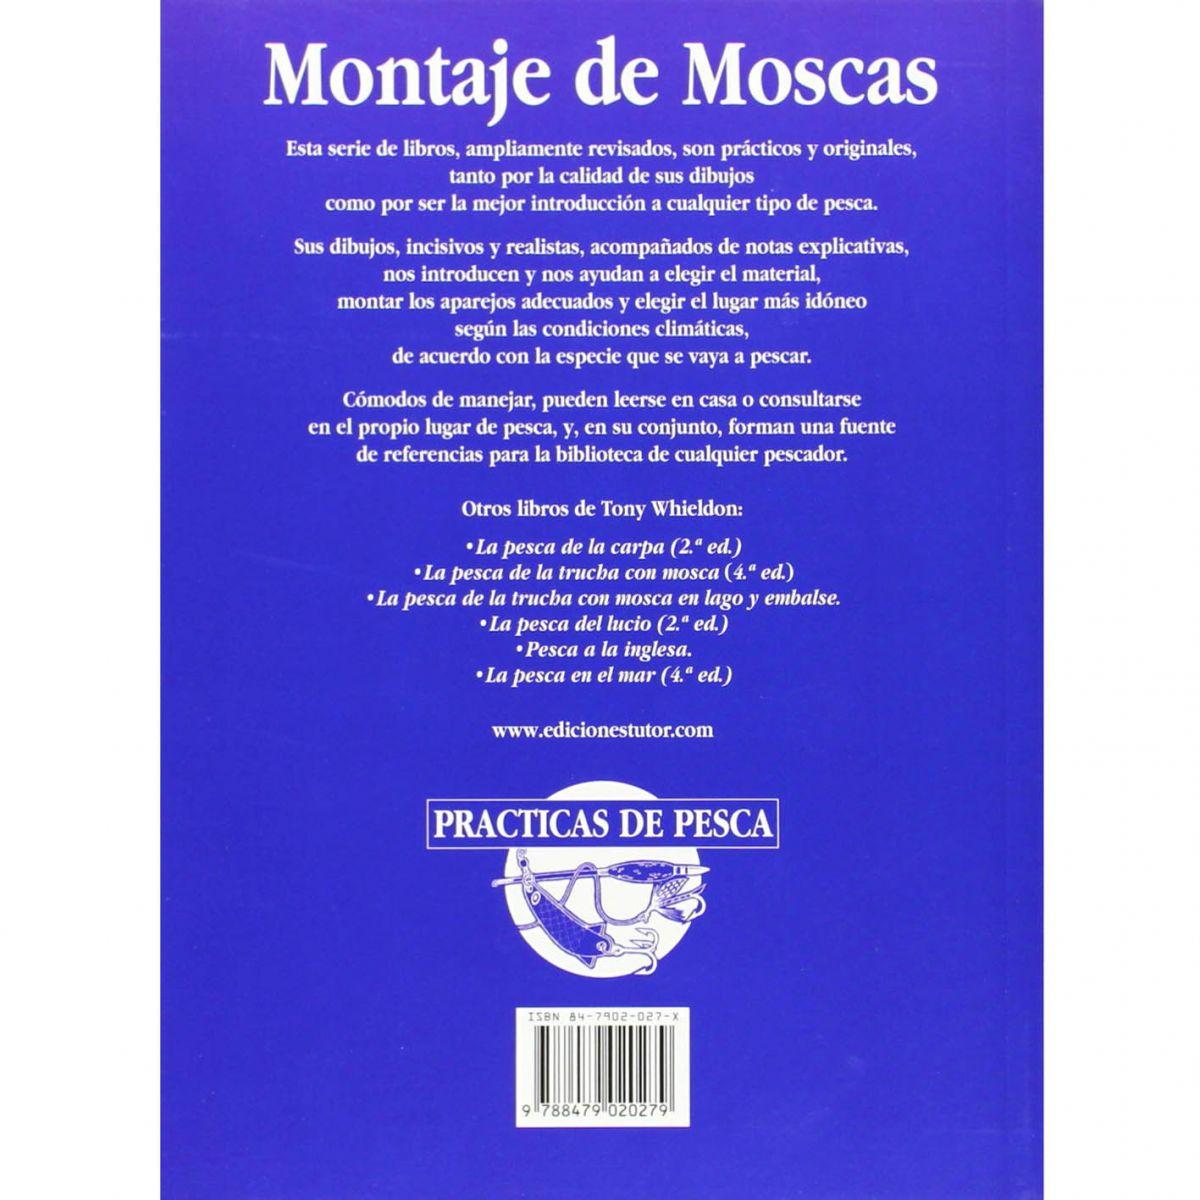 Livro Montaje de Moscas (Tony Whieldon)